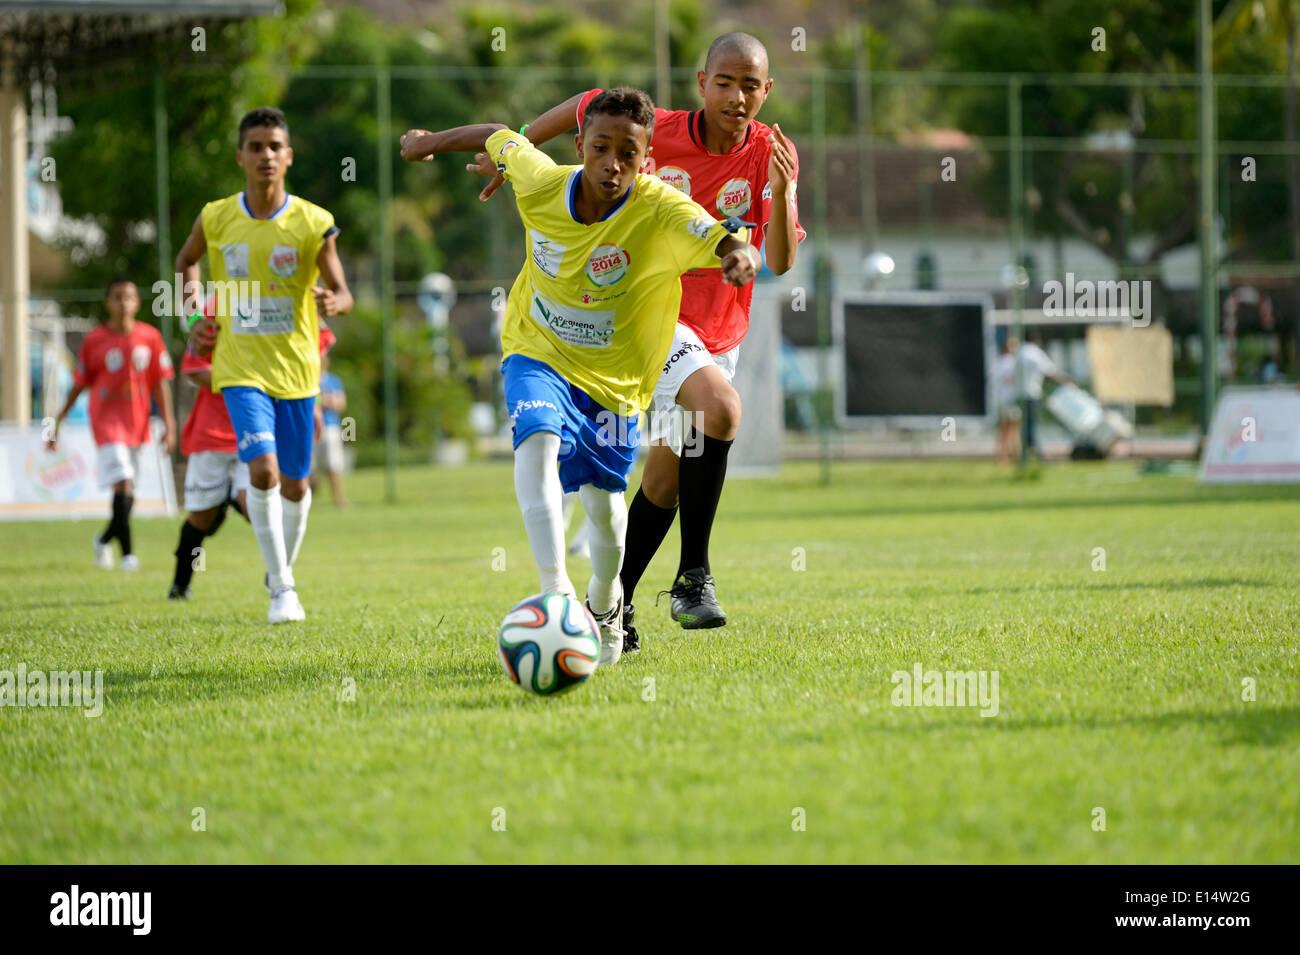 Soccer match, Brazil vs Egypt, Street Children World Cup 2014, Rio de Janeiro, Rio de Janeiro State, Brazil - Stock Image